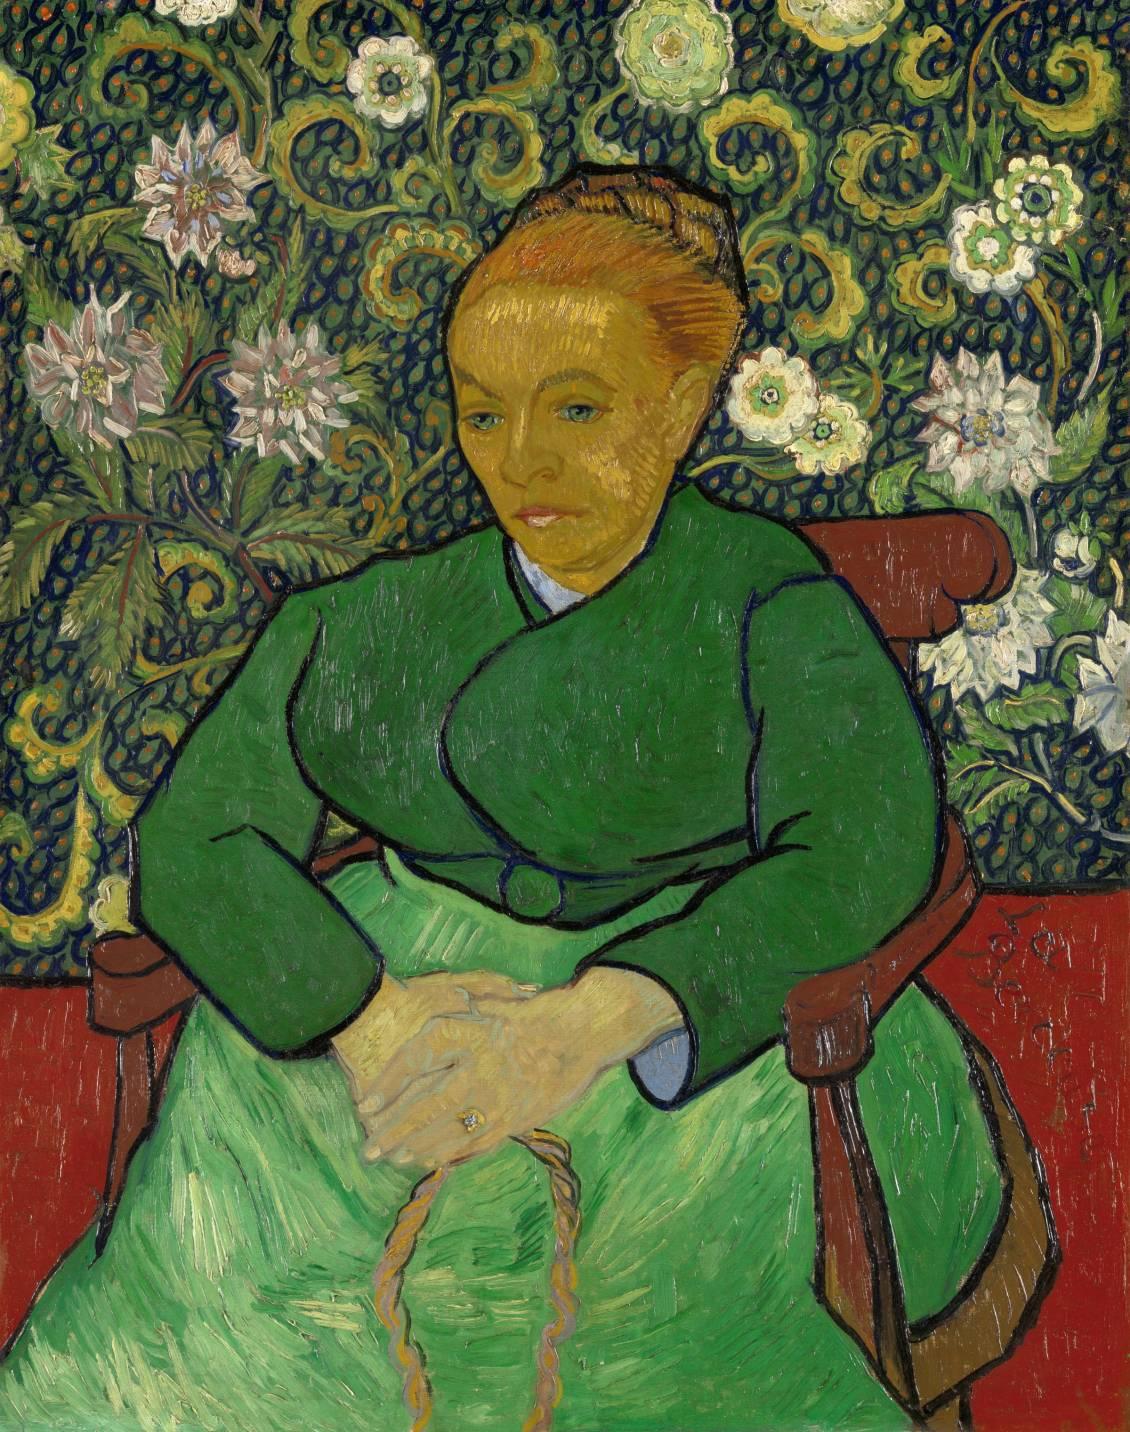 Vincent van Gogh, La Berceuse (portret van Madame Roulin), december 1888 - januari 1889